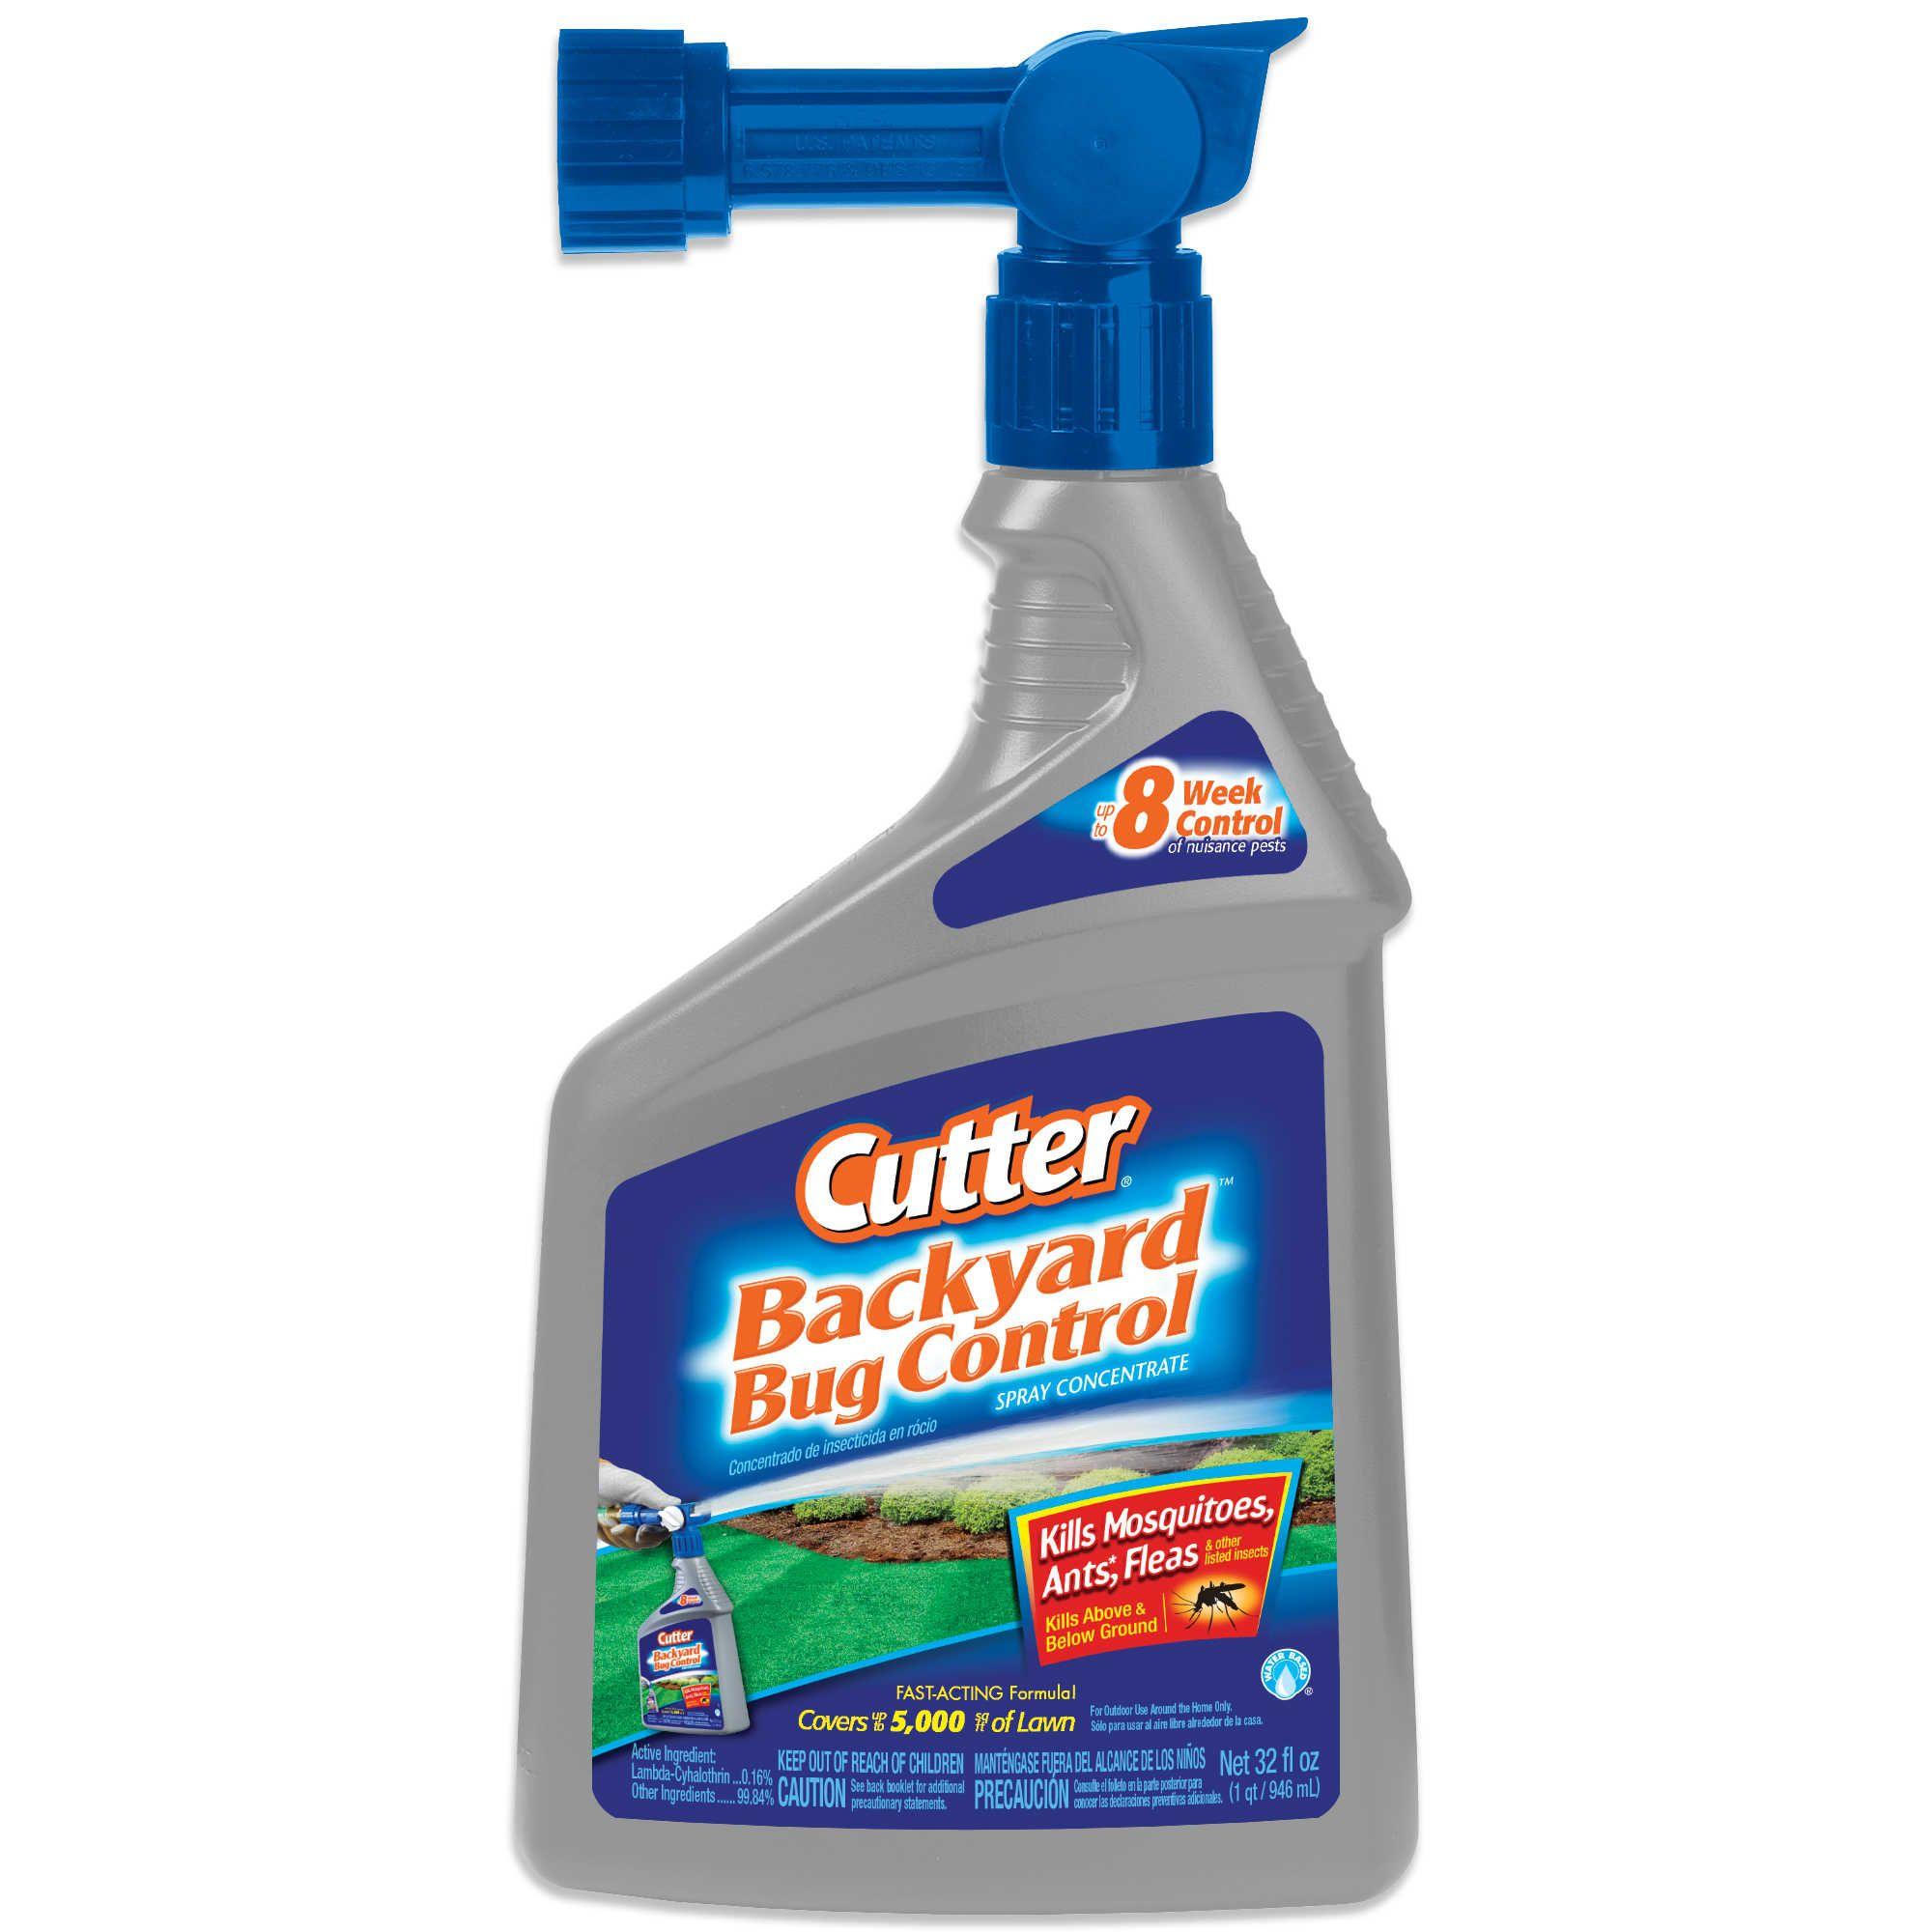 Cutter backyard 32ounce bug control spray concentrate